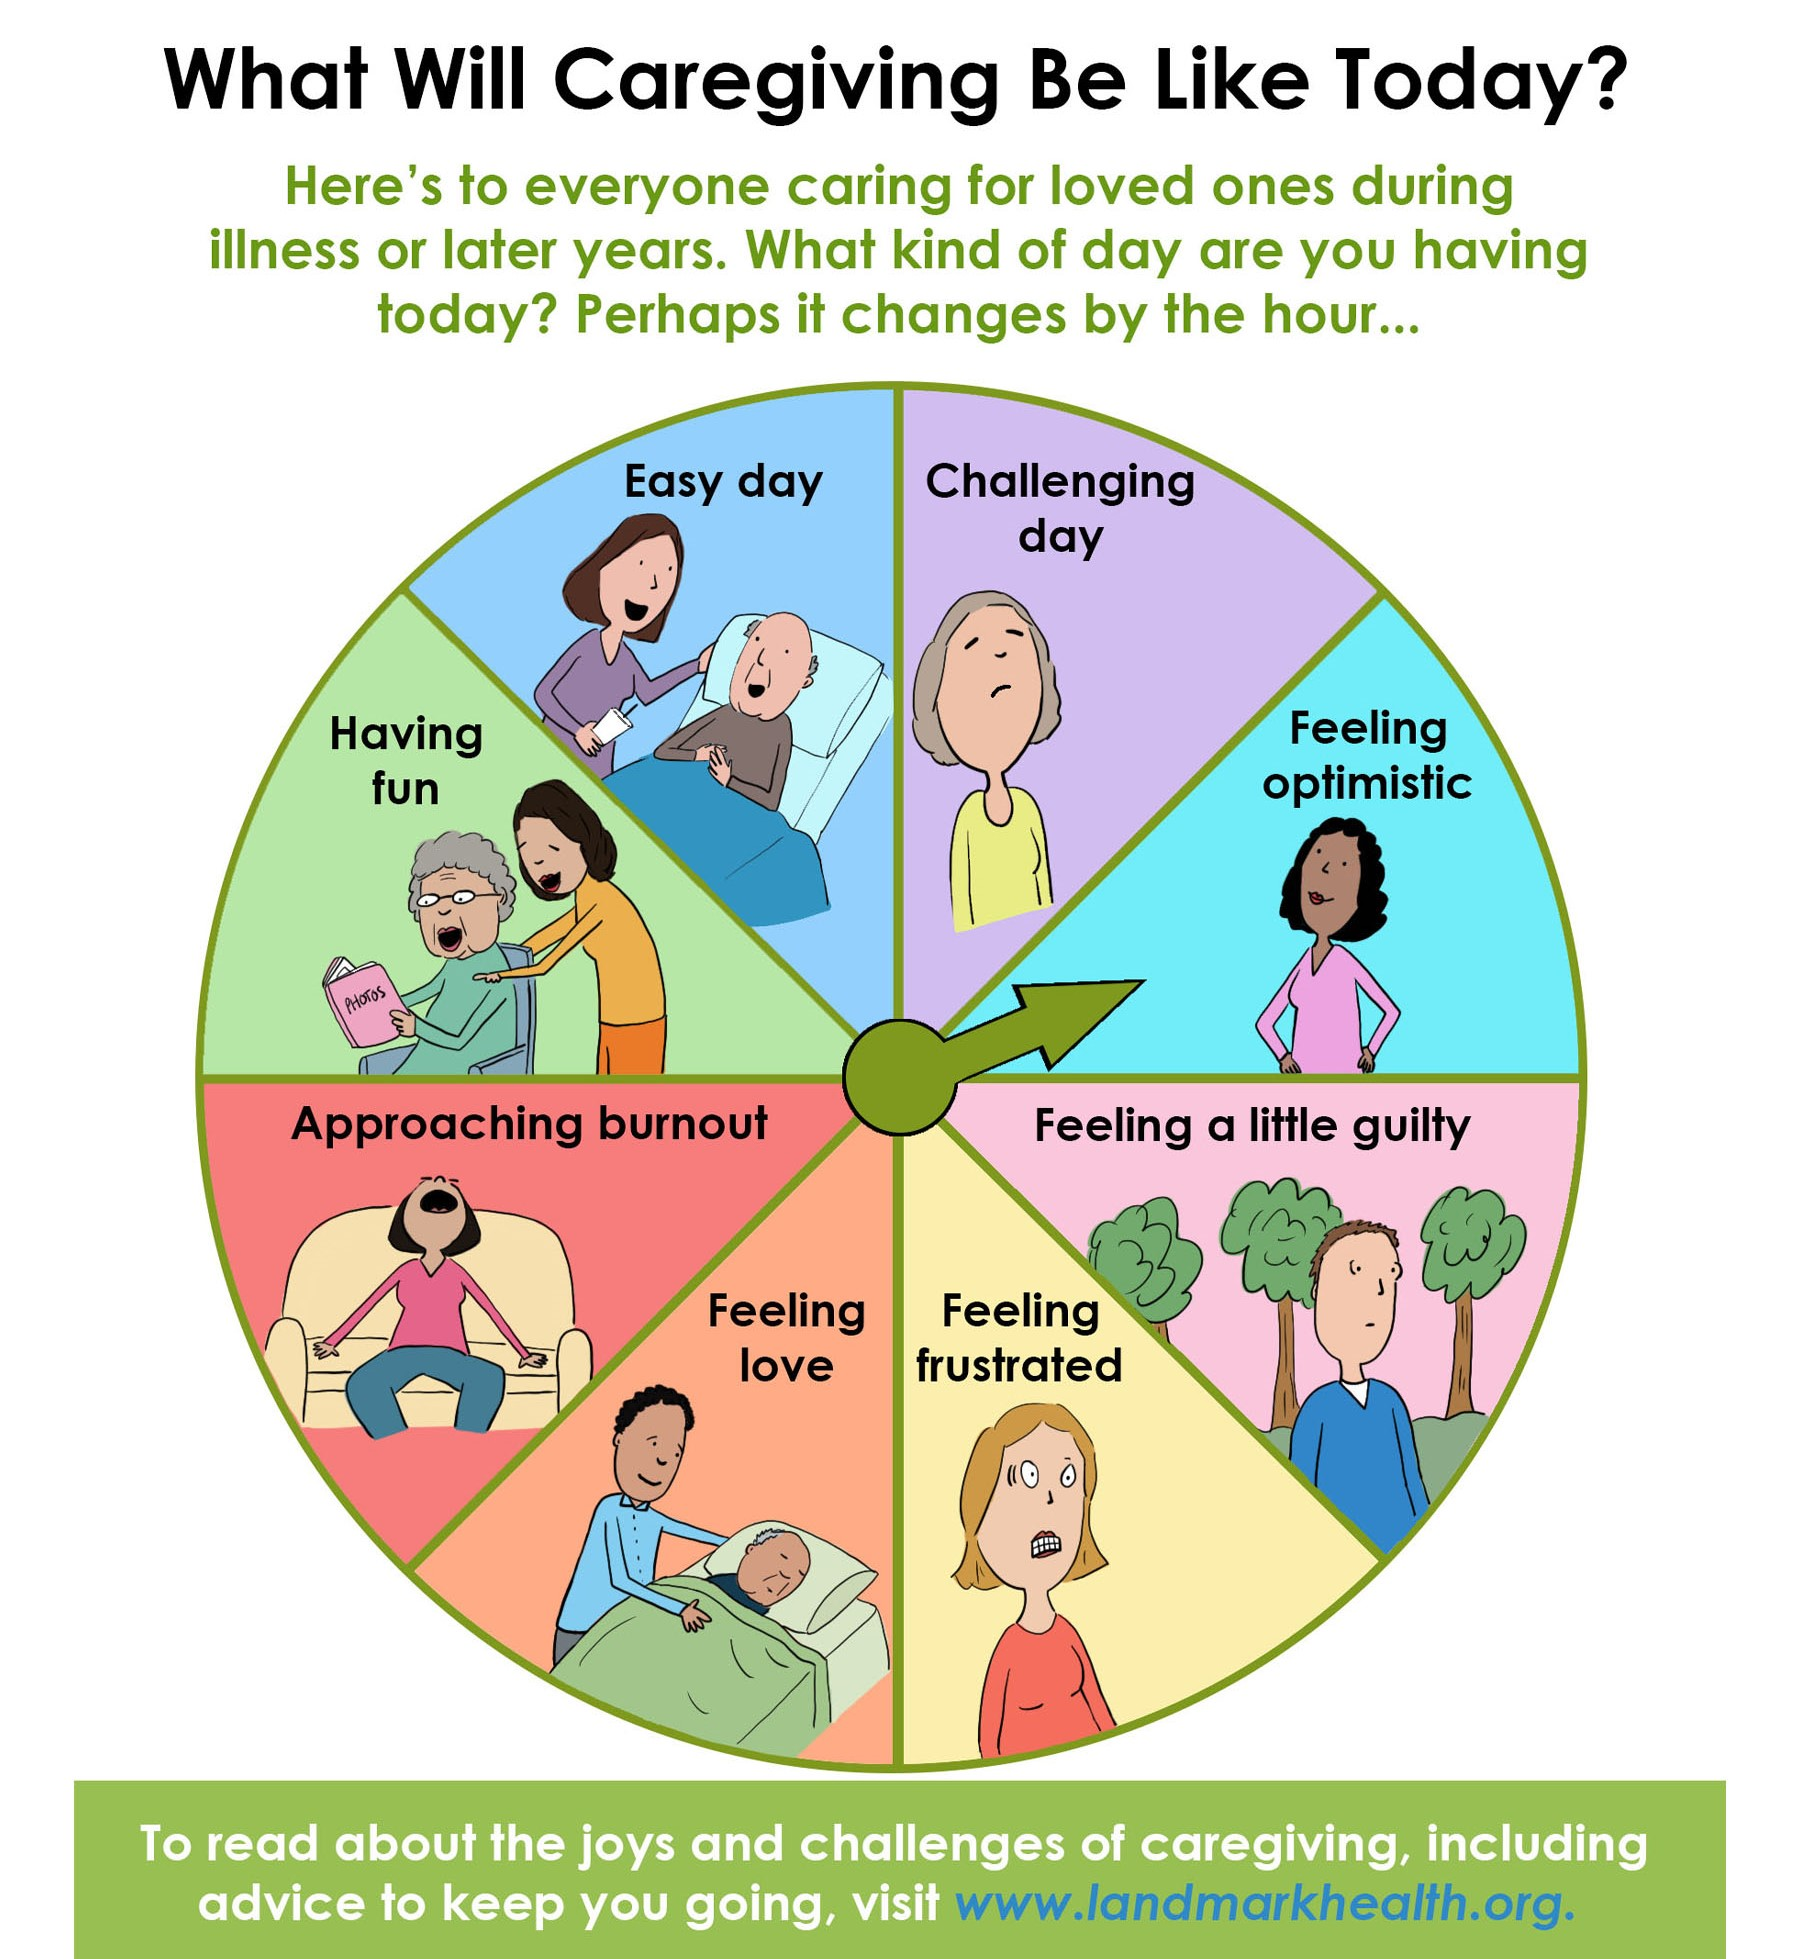 Caregiving - Hedger Humor Graphic